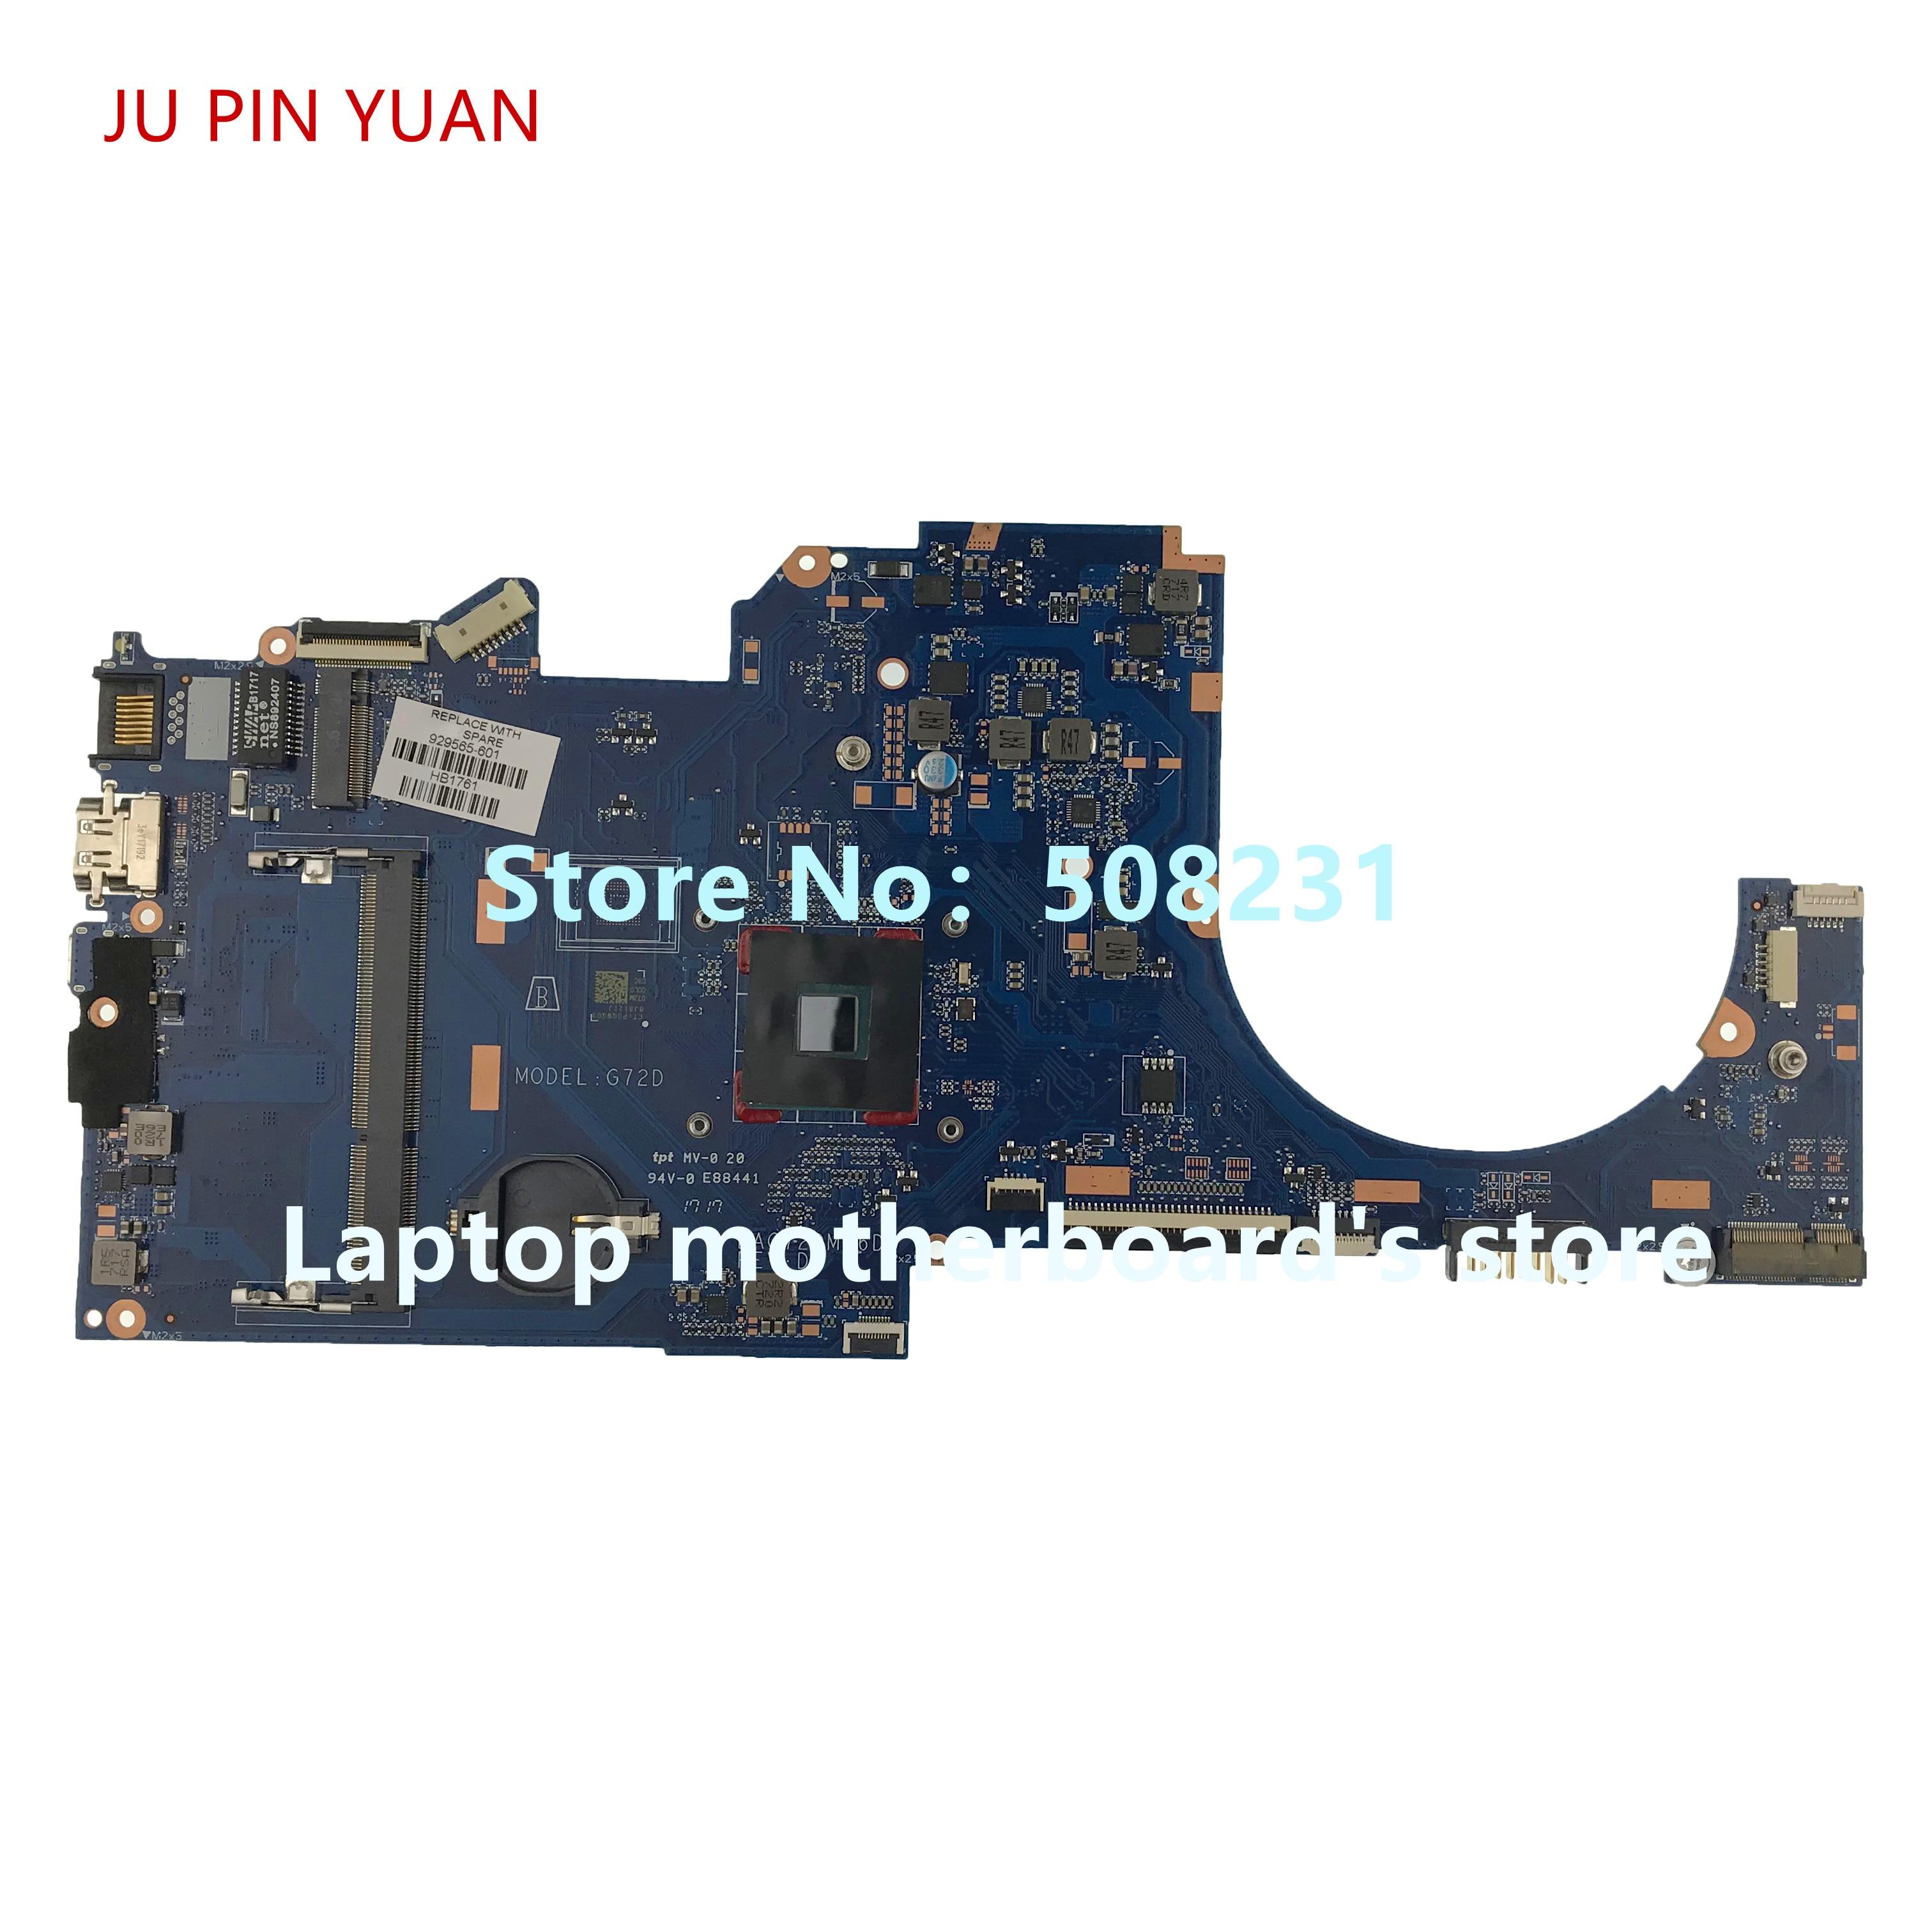 JU PIN YUAN 929565-601 G72D DAG72DMB6D0 motherboard For HP Laptop 14-BP 14-bp038TX Notebook PC CelN3060 fully TestedJU PIN YUAN 929565-601 G72D DAG72DMB6D0 motherboard For HP Laptop 14-BP 14-bp038TX Notebook PC CelN3060 fully Tested